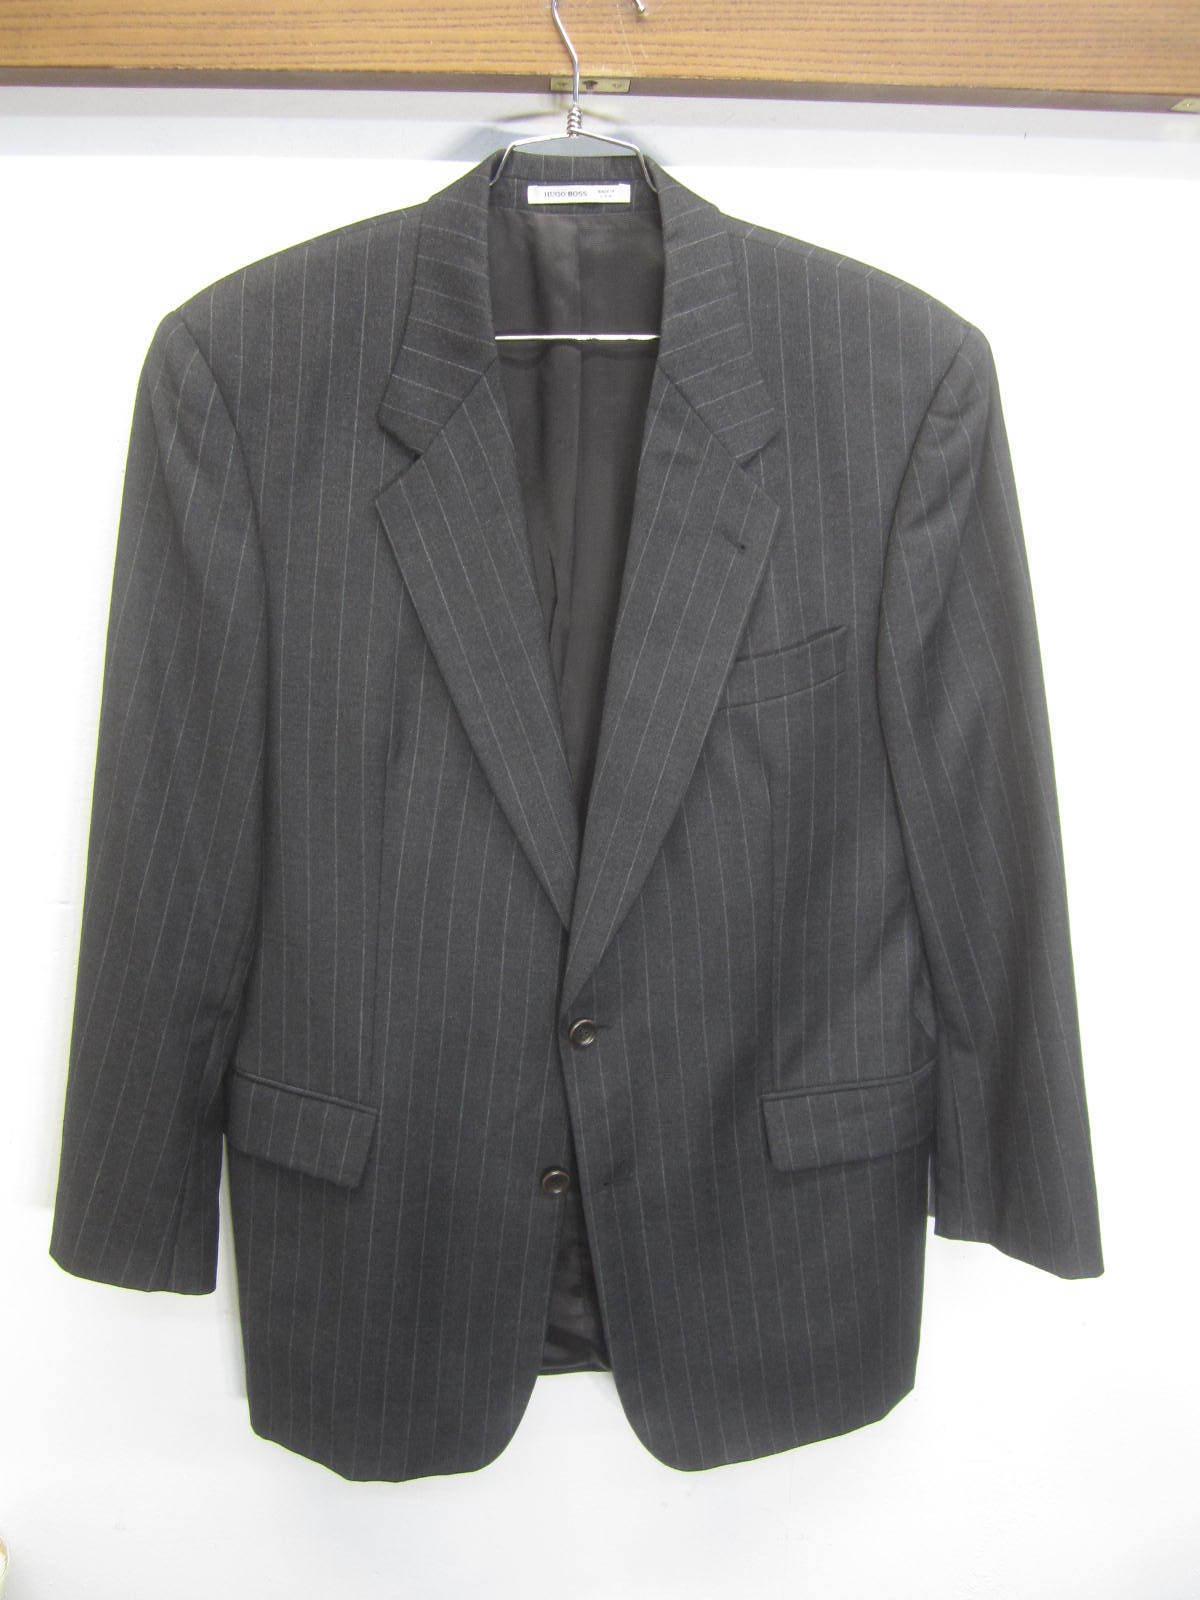 Vtg Hugo Boss Blazer Sport Coat charcoal pinstripe wool 2 btn sz 42L made in USA